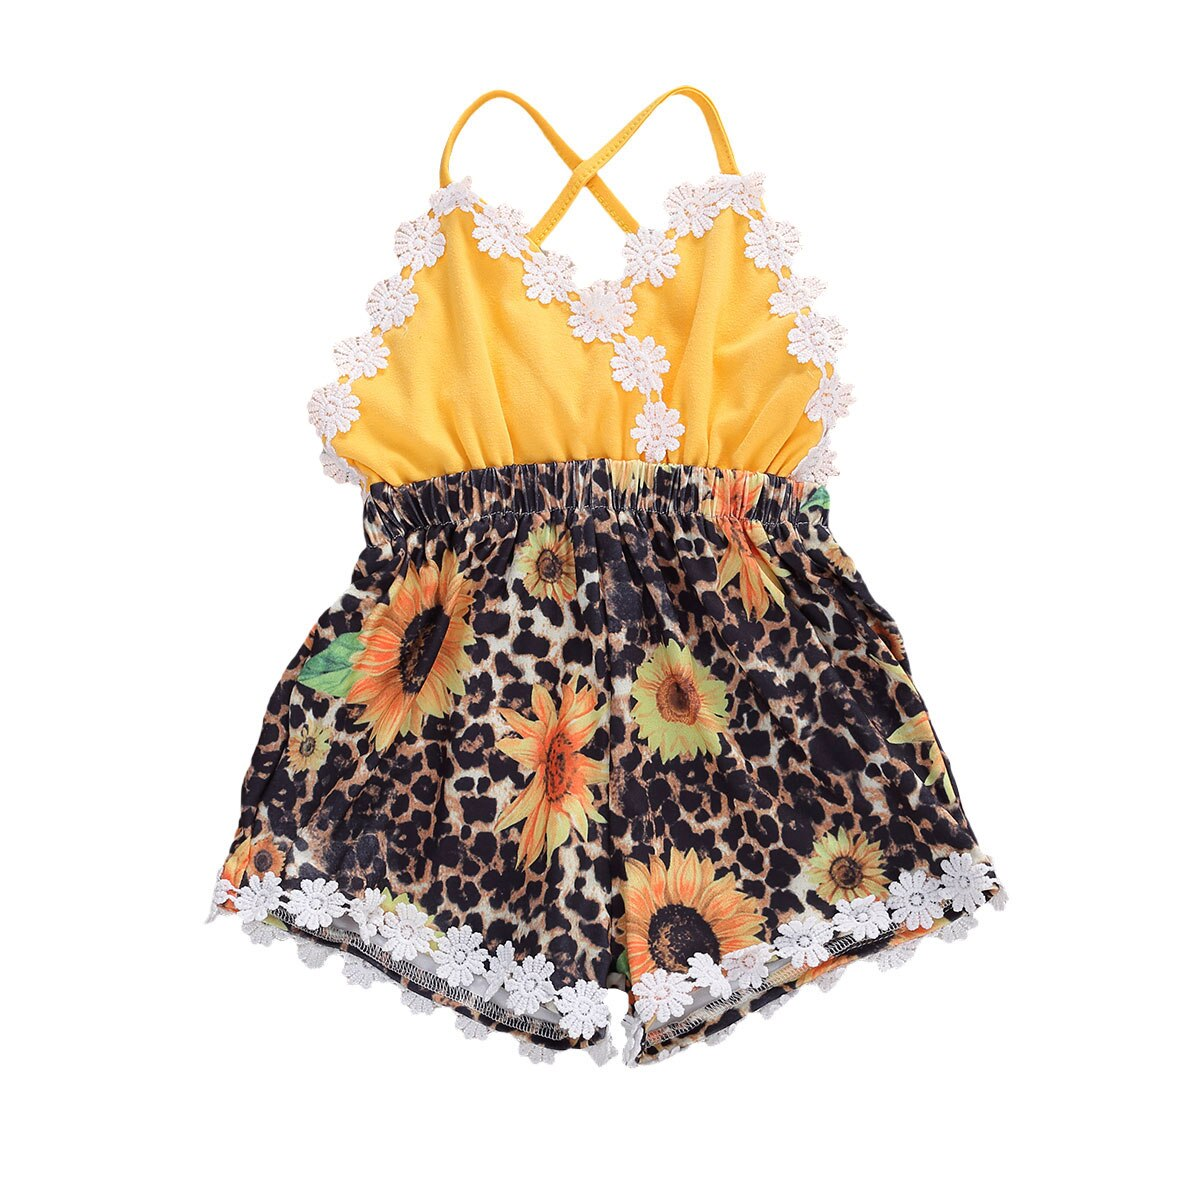 Nueva moda bebé niña leopardo Romper sin mangas cuello pico encaje mono con girasoles 0-24M